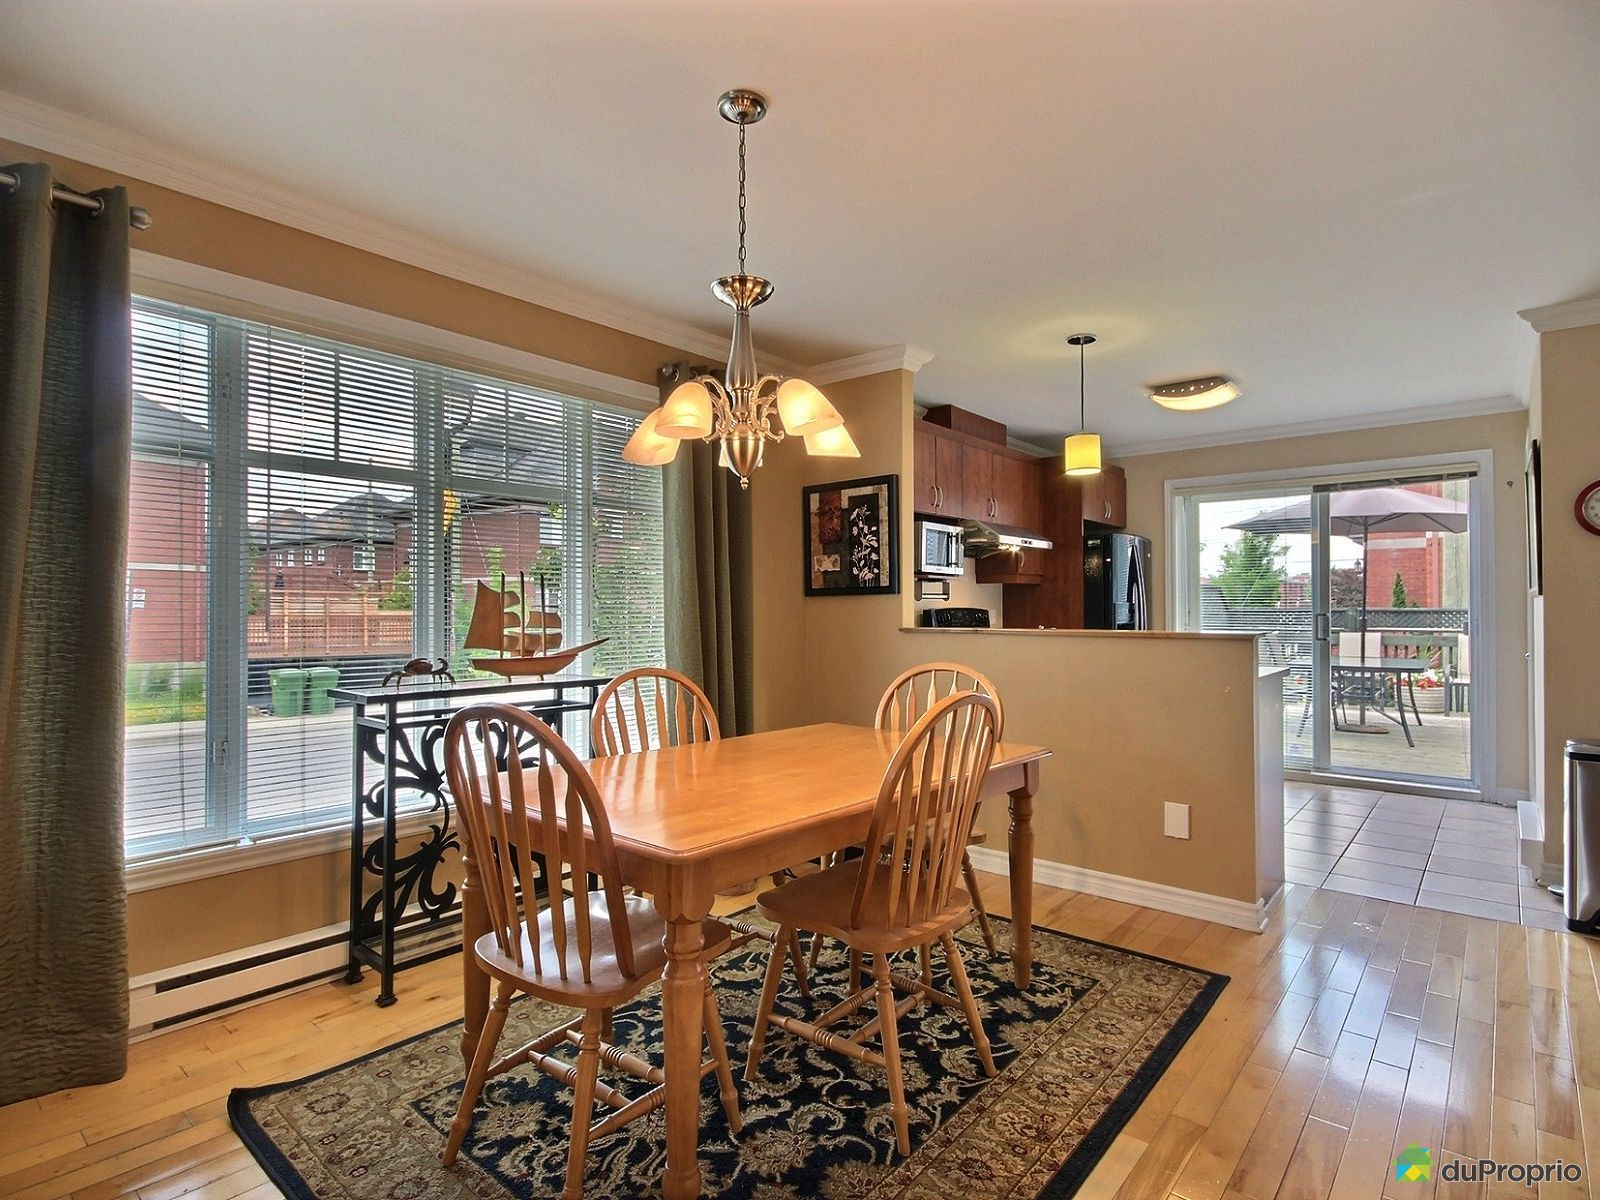 maison vendre montr al 2999 rue anne h bert immobilier qu bec duproprio 707574. Black Bedroom Furniture Sets. Home Design Ideas